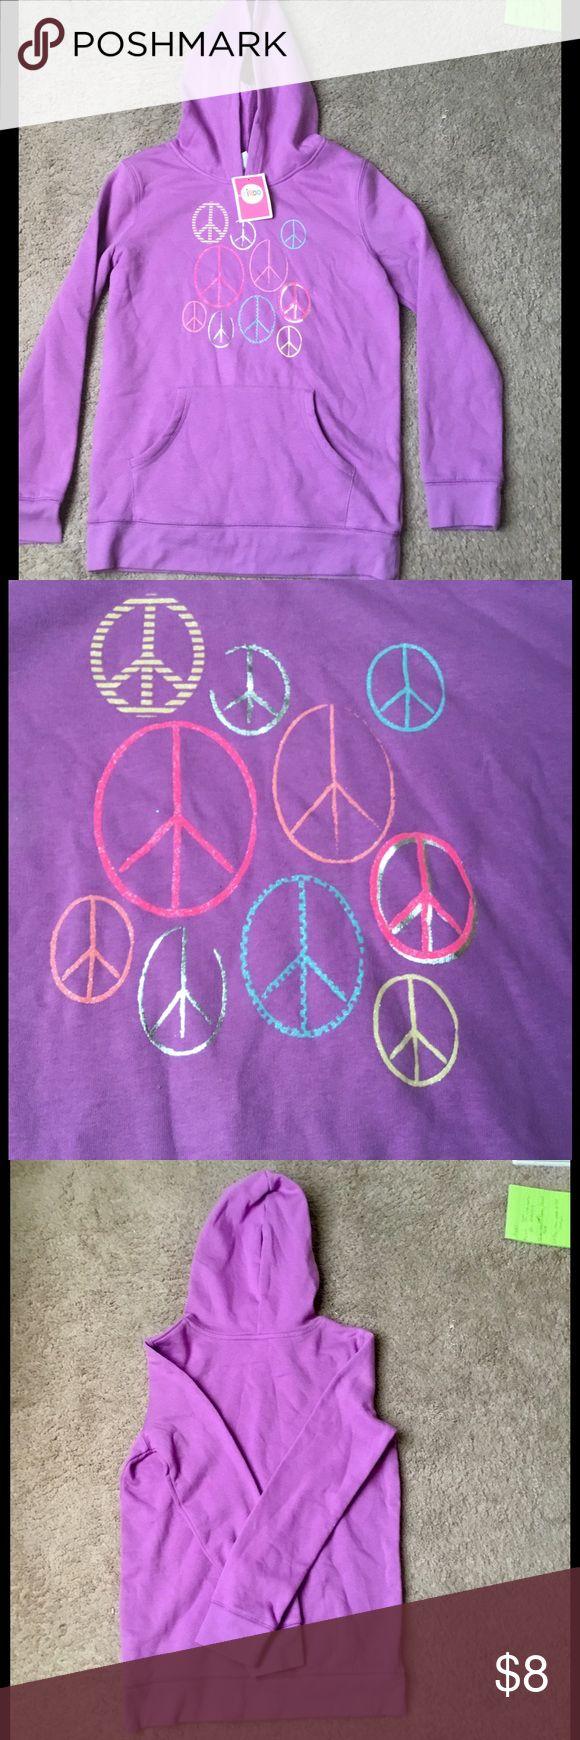 🍭🍭NWT Purple CIRCO Hoodie with Peace Signs 🍭🍭 NWT CIRCO Girls Purple Hoodie with peace signs.  Size XL 14/16. Circo Shirts & Tops Sweatshirts & Hoodies